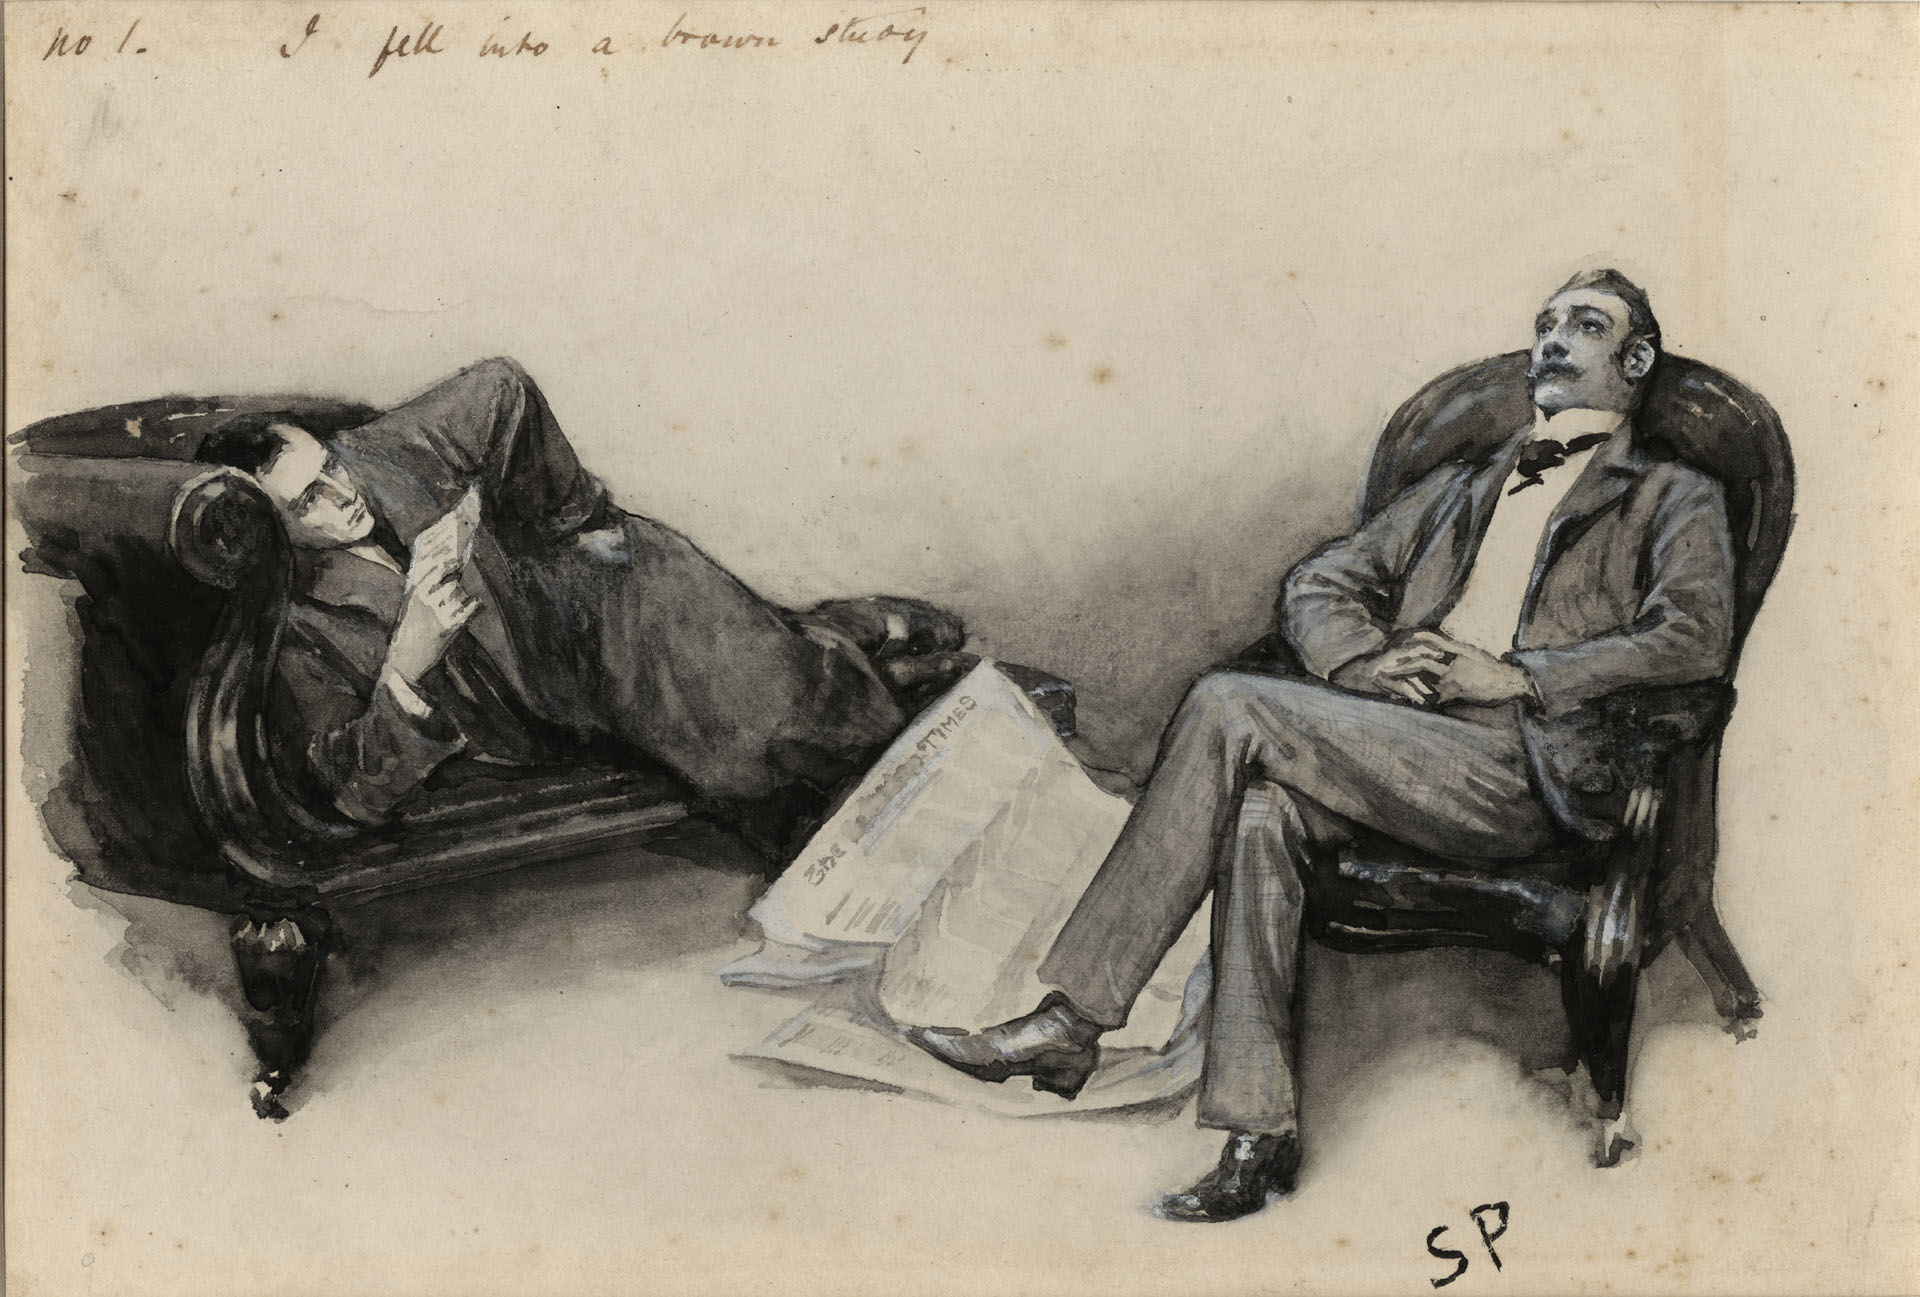 Sherlock poses while Watson stares exasperatedly into the sky: ho-yay